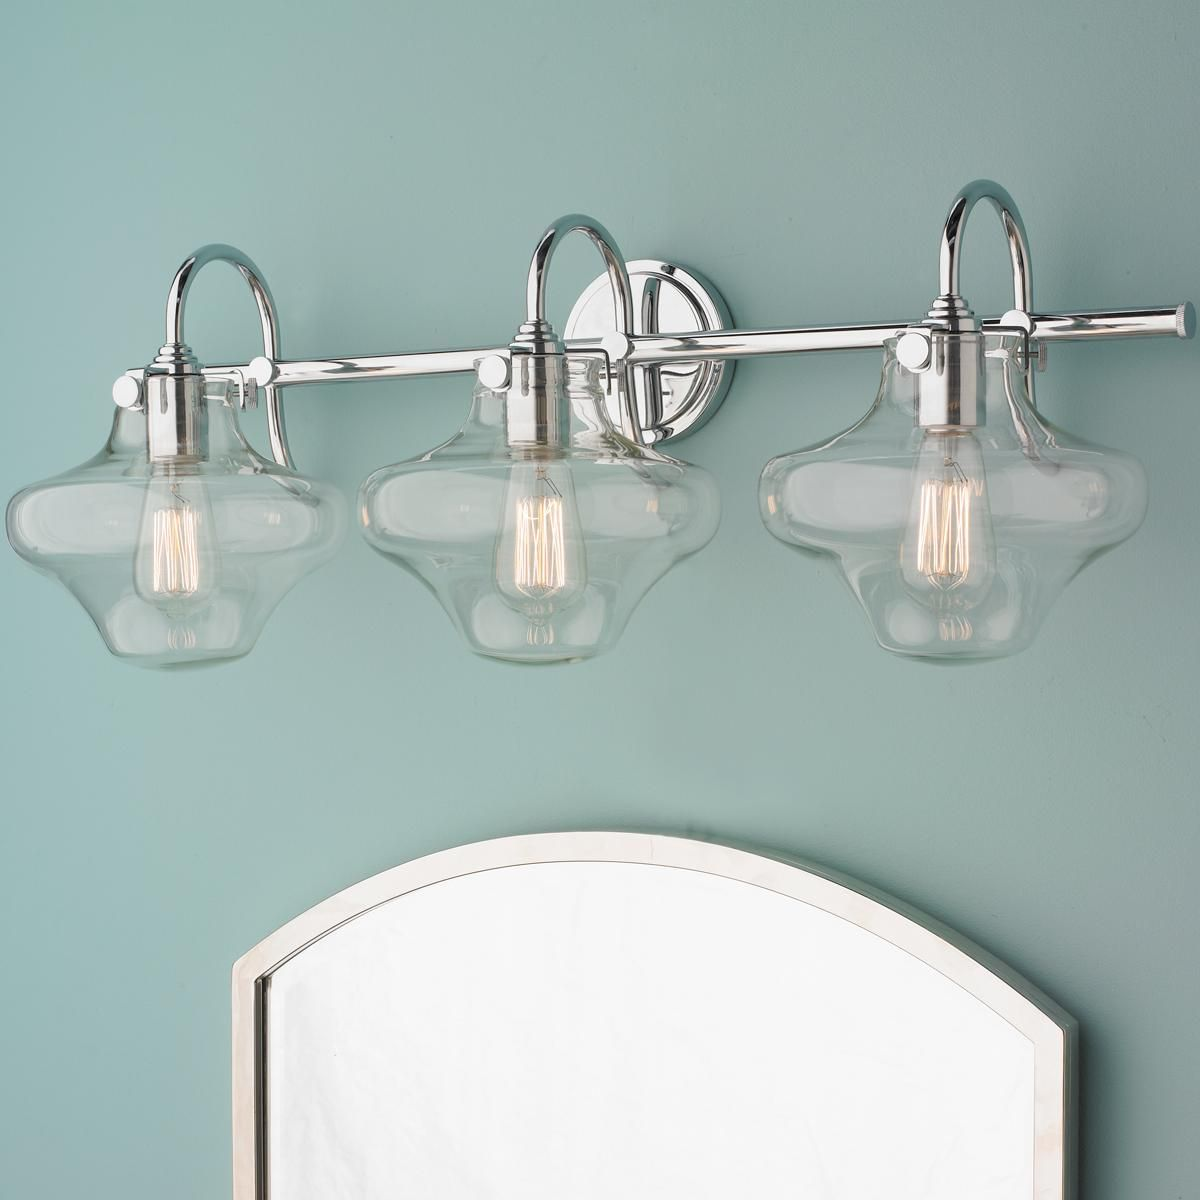 Bathroom Vanity Lights Clear Glass retro glass globe bath light - 2 light | bath light, canopy and globe